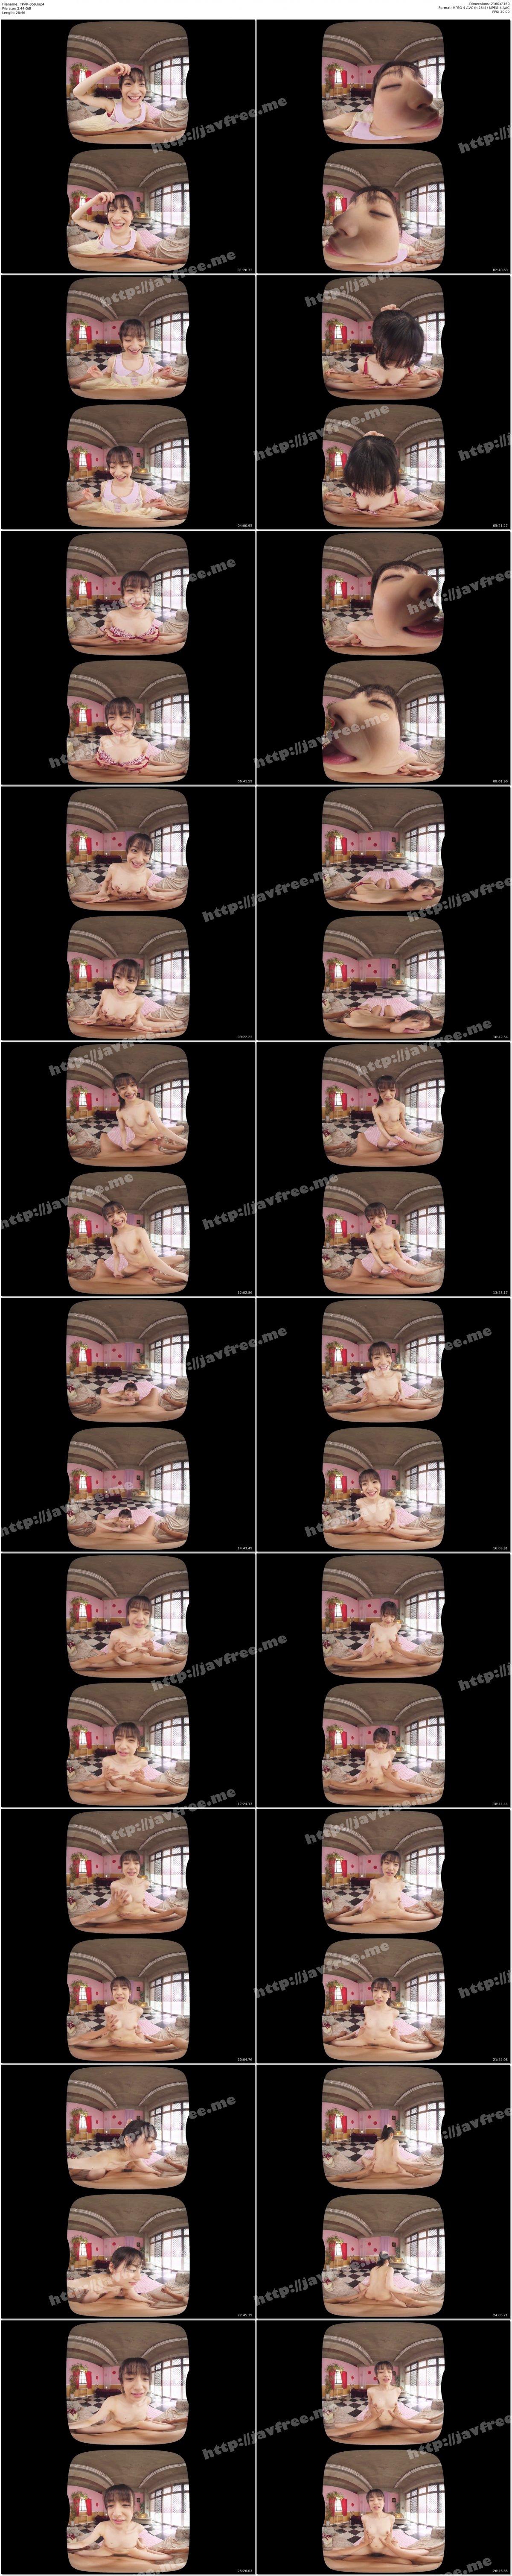 [HD][VEC-360] 部長の奥さんがエロすぎて… 八木あずさ - image TPVR-059 on https://javfree.me